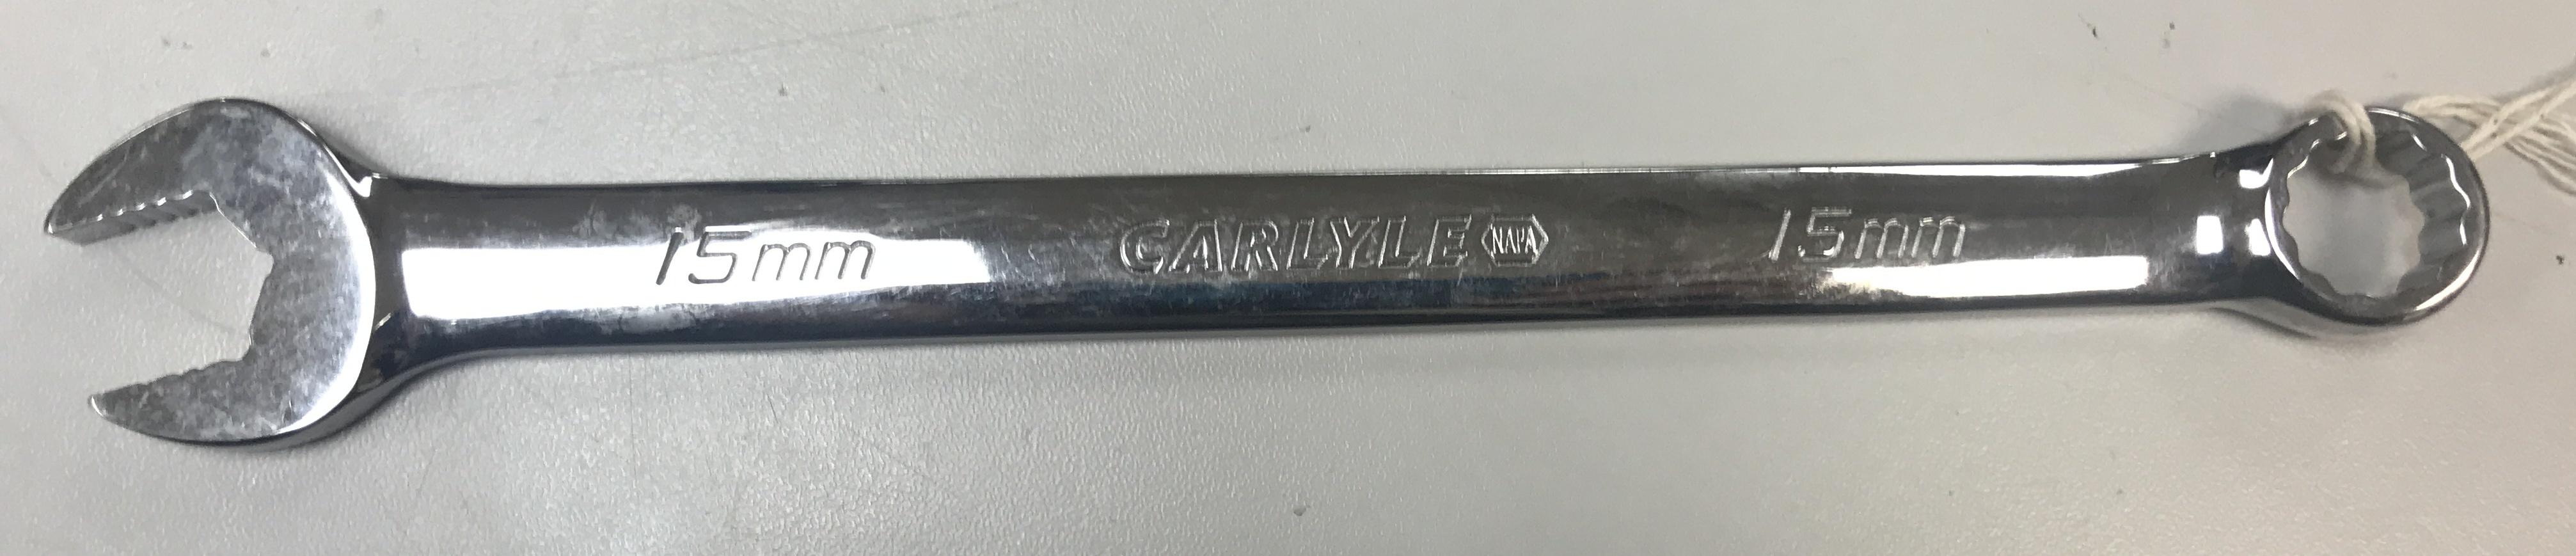 NAPA Carlyle CWLNS114M 14mm